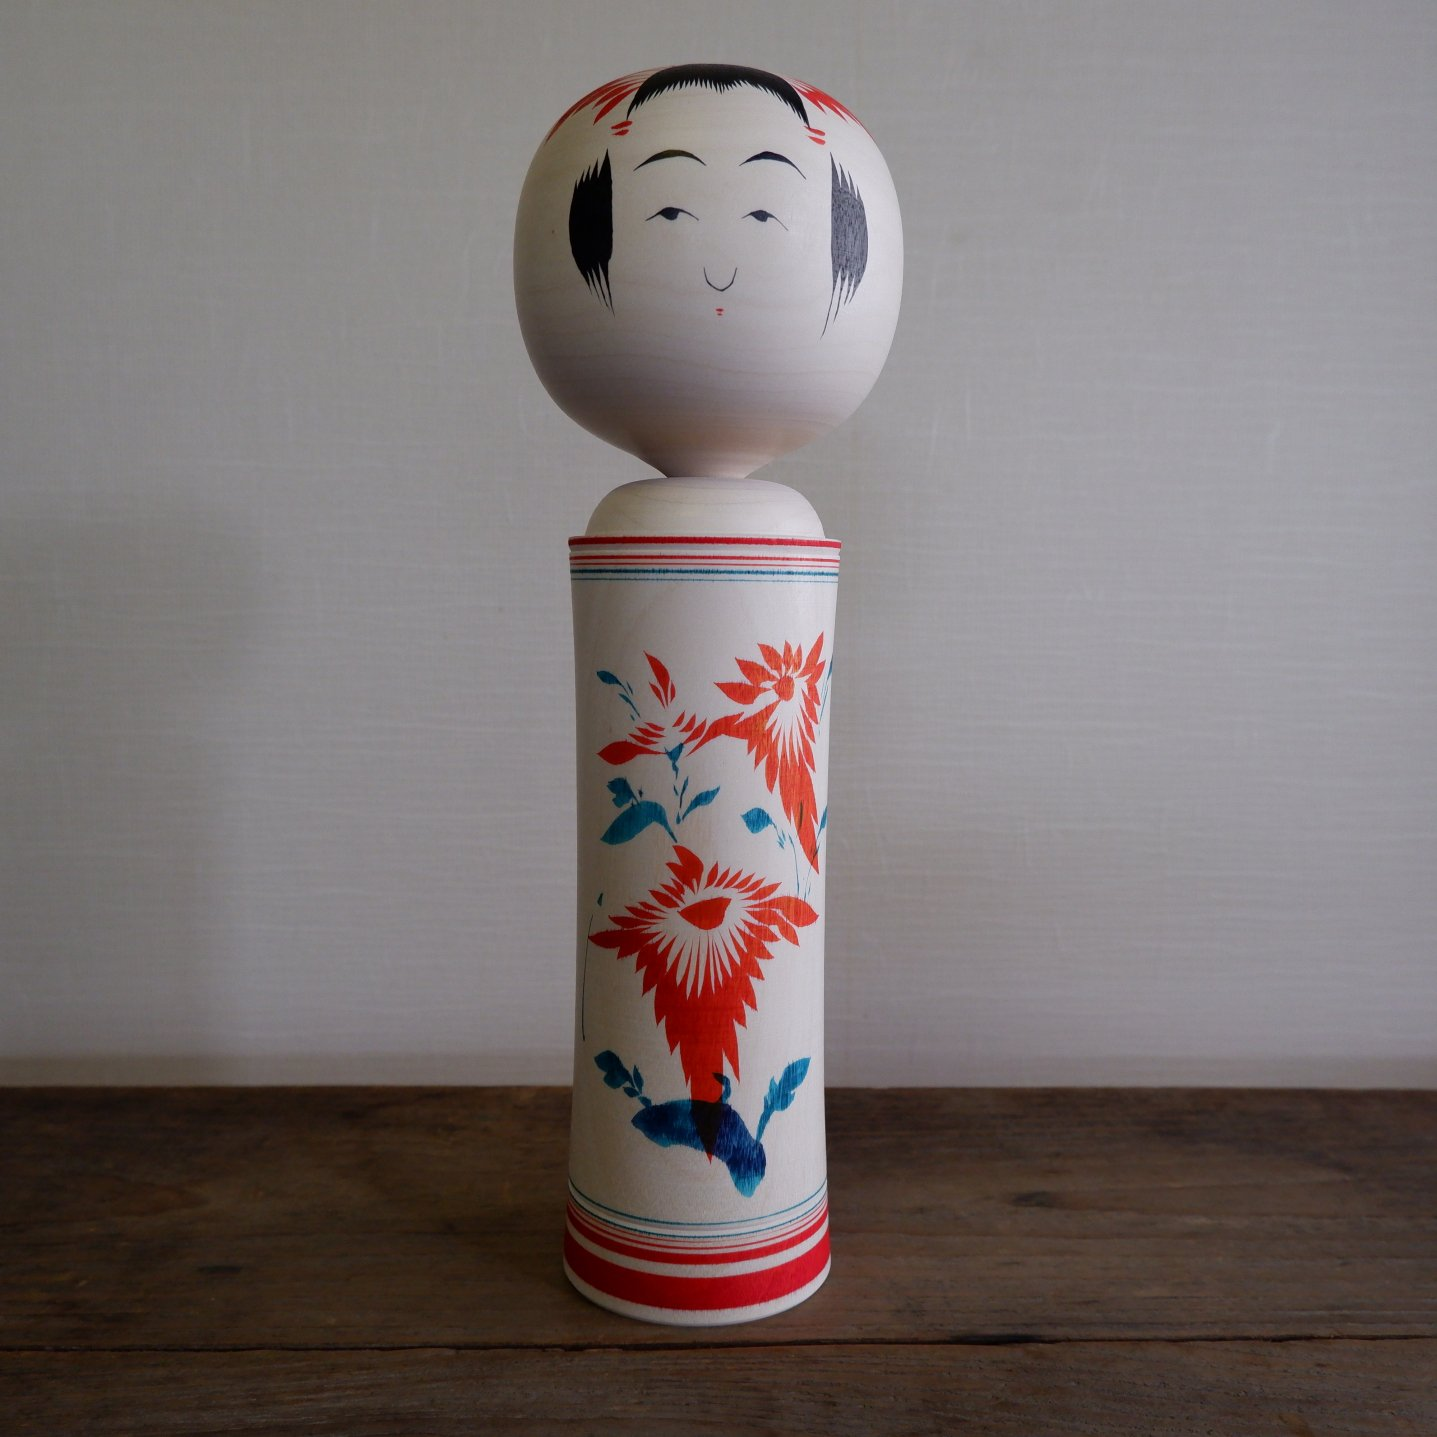 【New 9/4販売】国府田コレクション〈万之丞型1尺1寸c〉